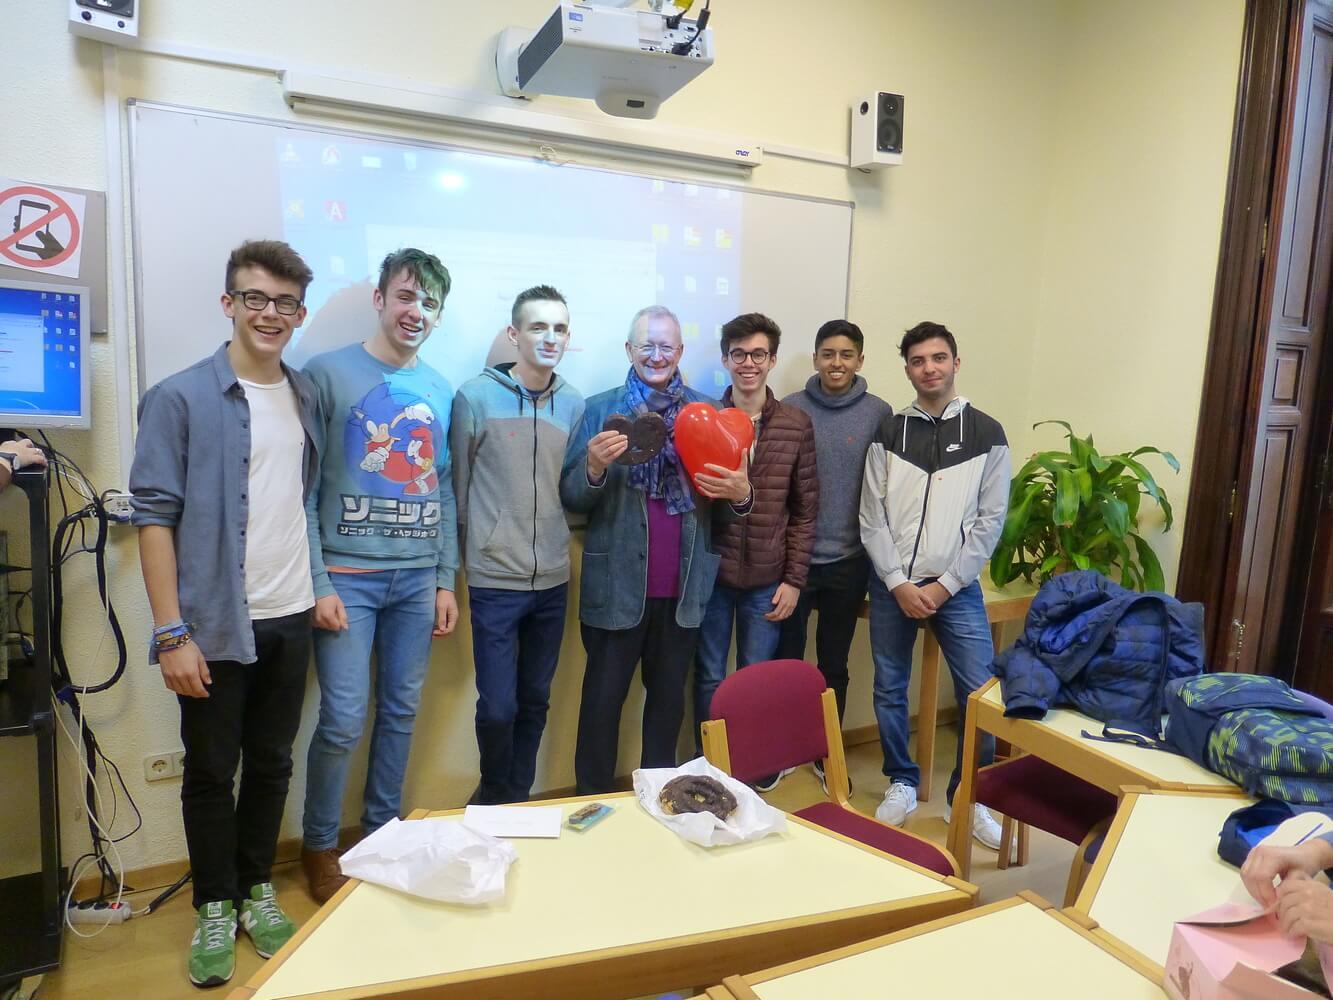 Visit of students of Manchester Grammar School, 2018, Valentine's Day